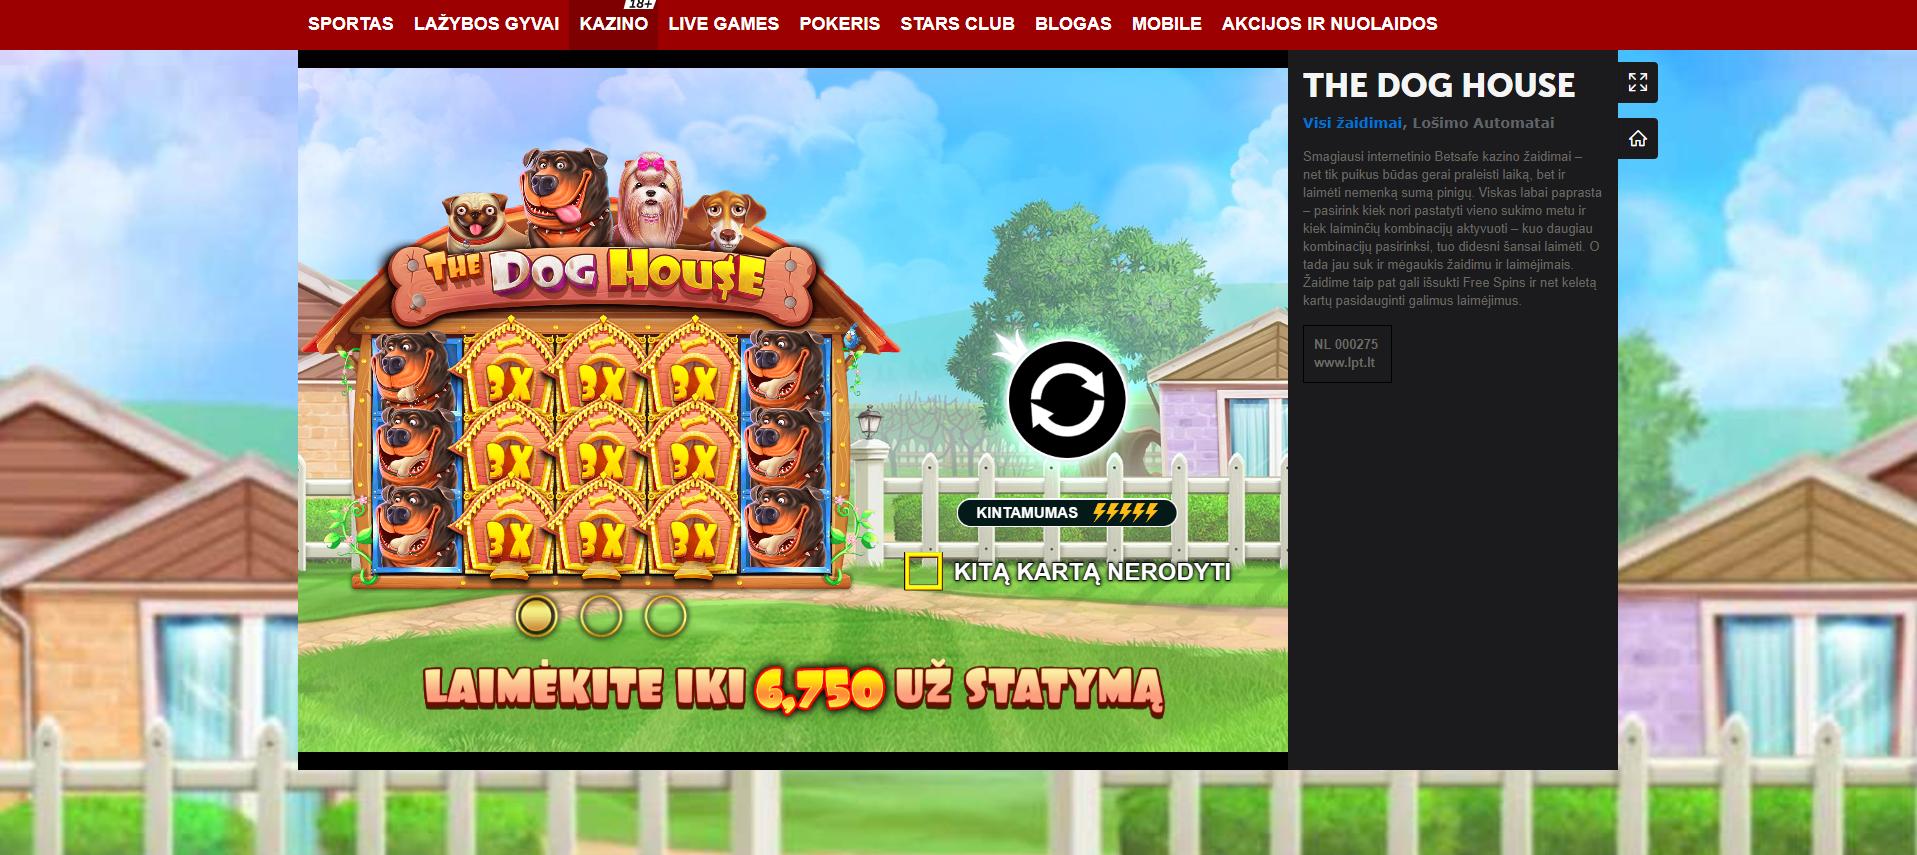 the dog house betsafe kazino lošimo automatas 6750x bet